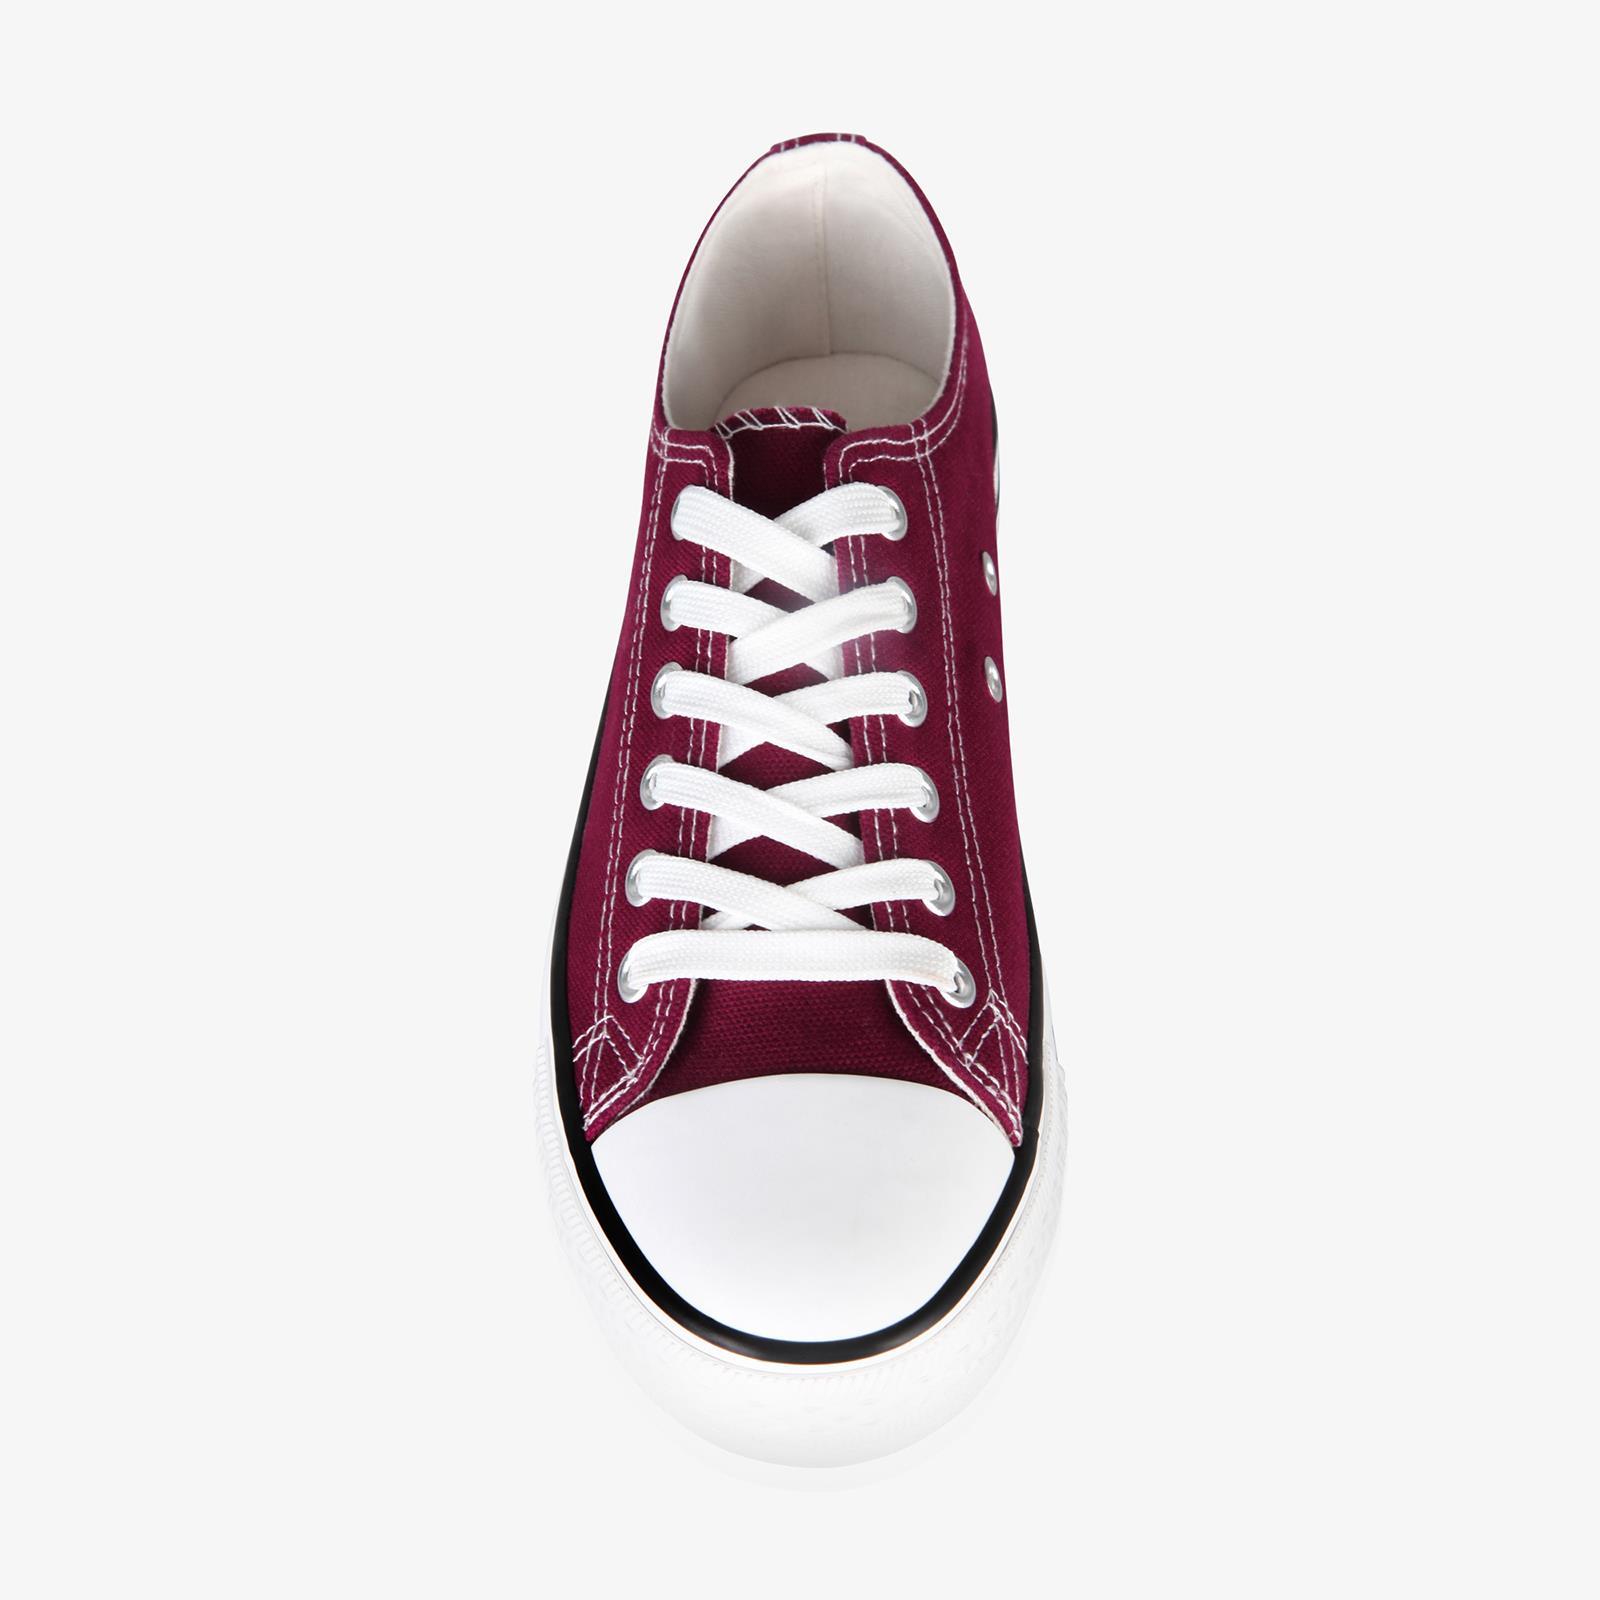 Zapatillas-Mujer-Casuales-Deportiva-Barata-Lona-Moda-Originales-Outlet-Tela-Moda miniatura 14